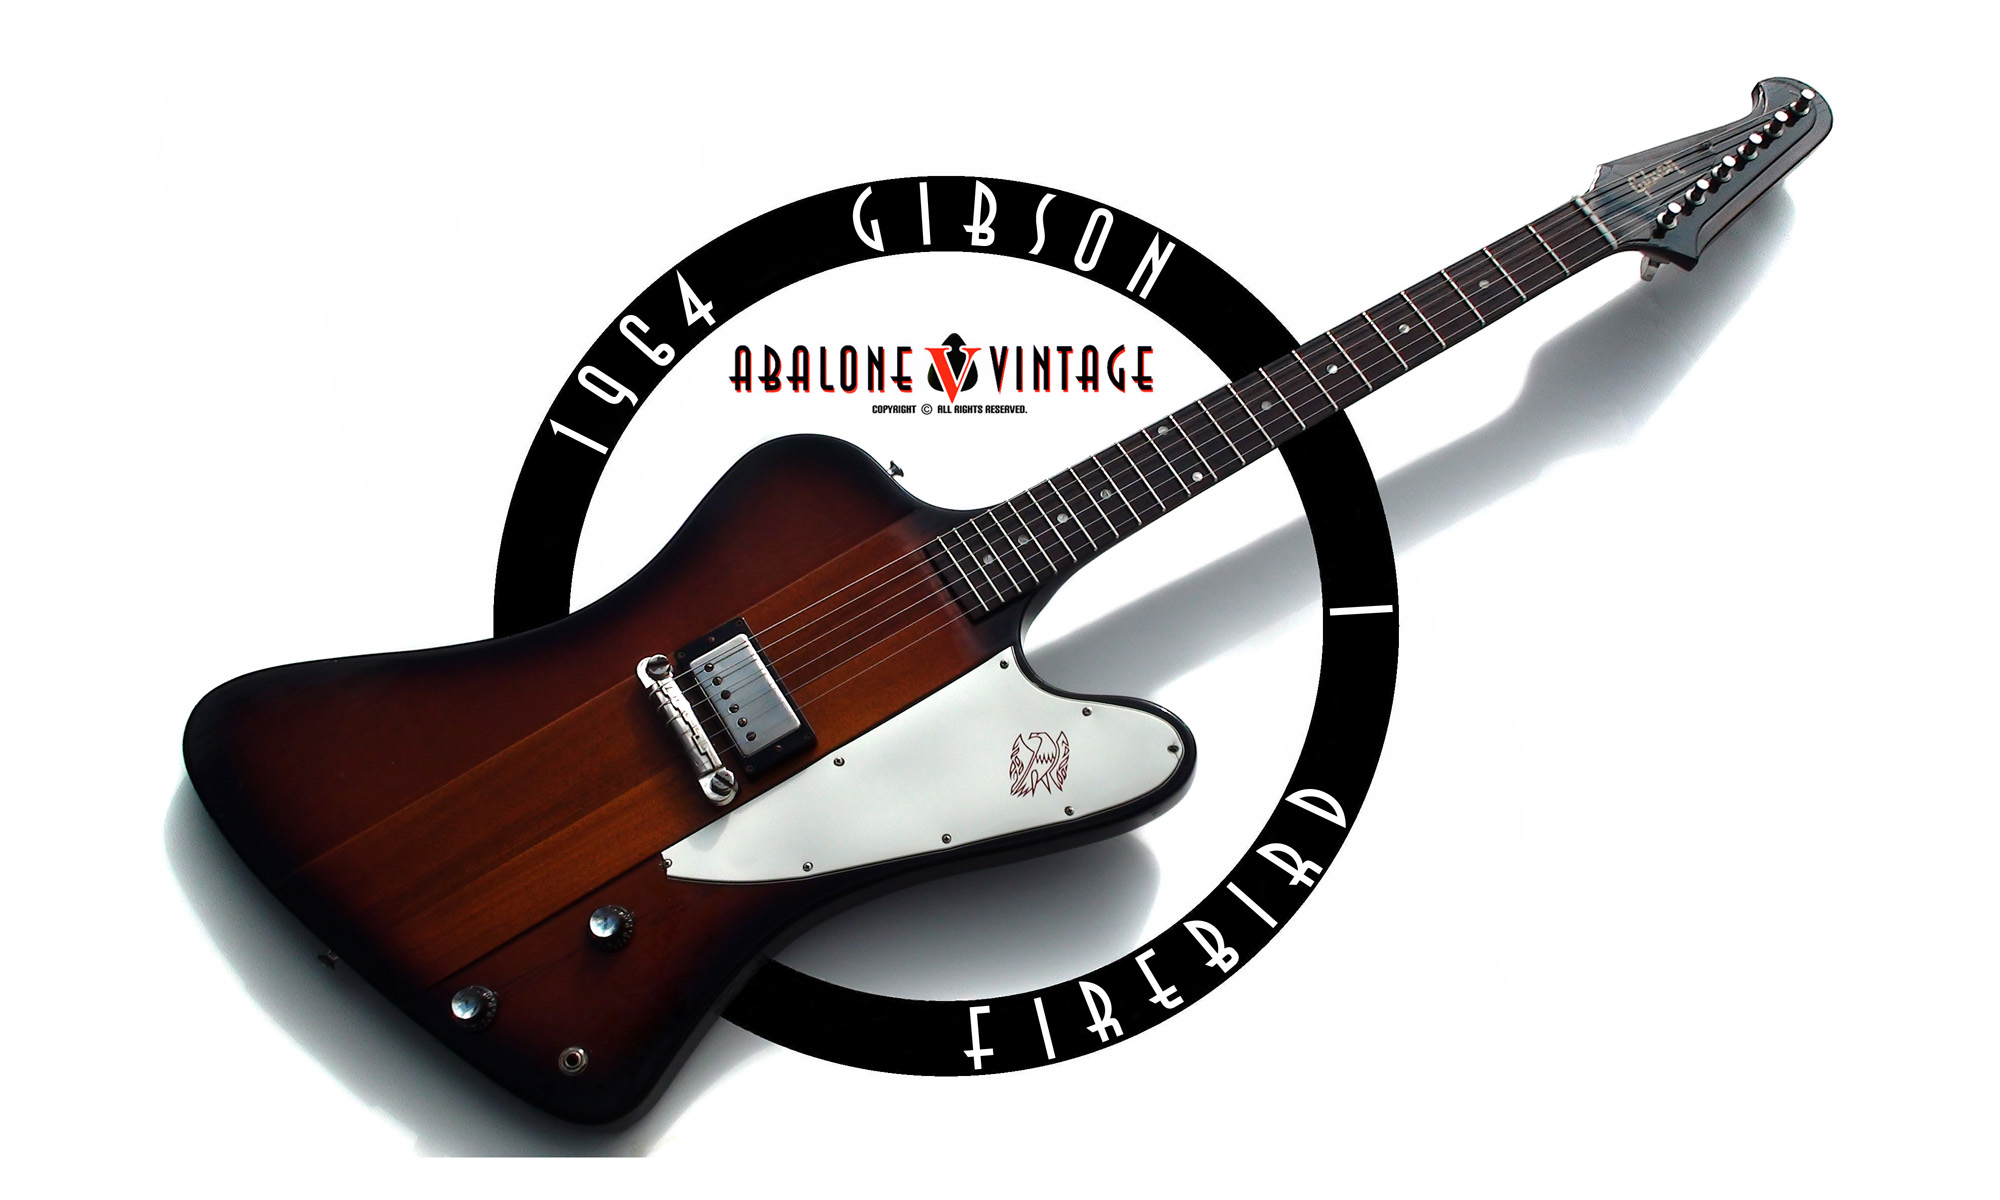 Guitar Wallpapers 1959 Gibson Les Paul Standard Reissue 1800 X 1200